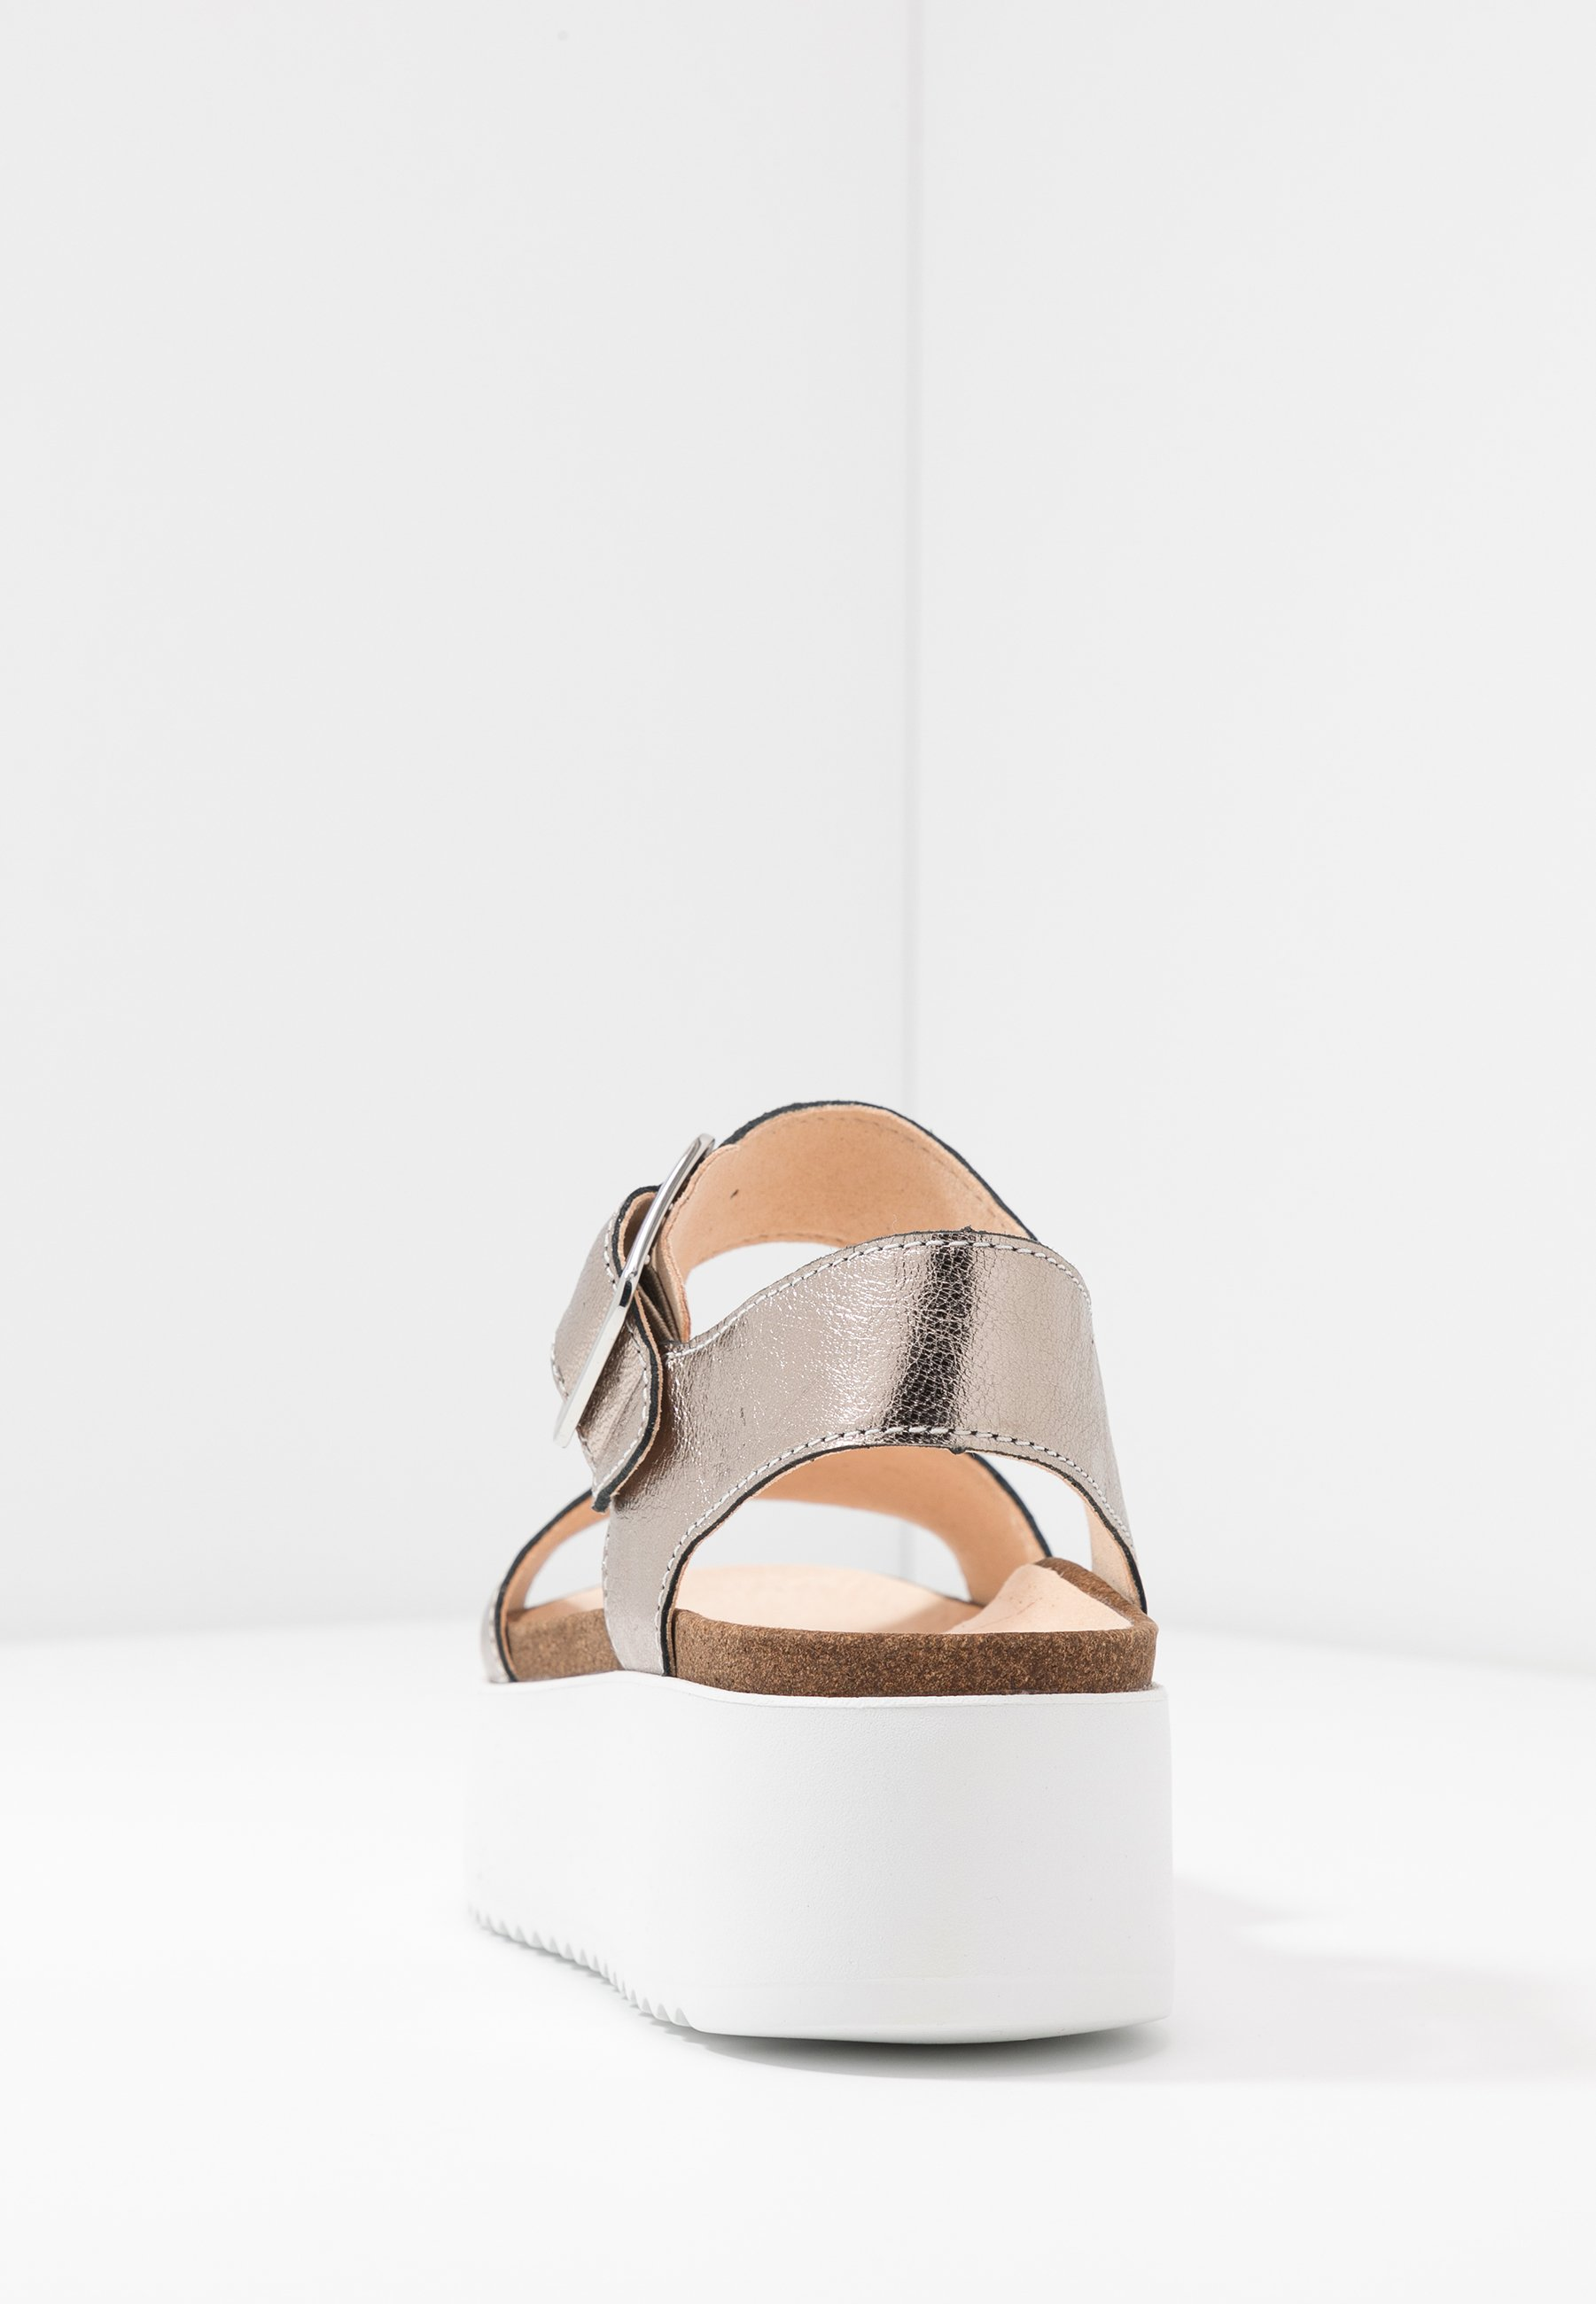 Clarks BOTANIC STRAP - Sandales à plateforme - stone